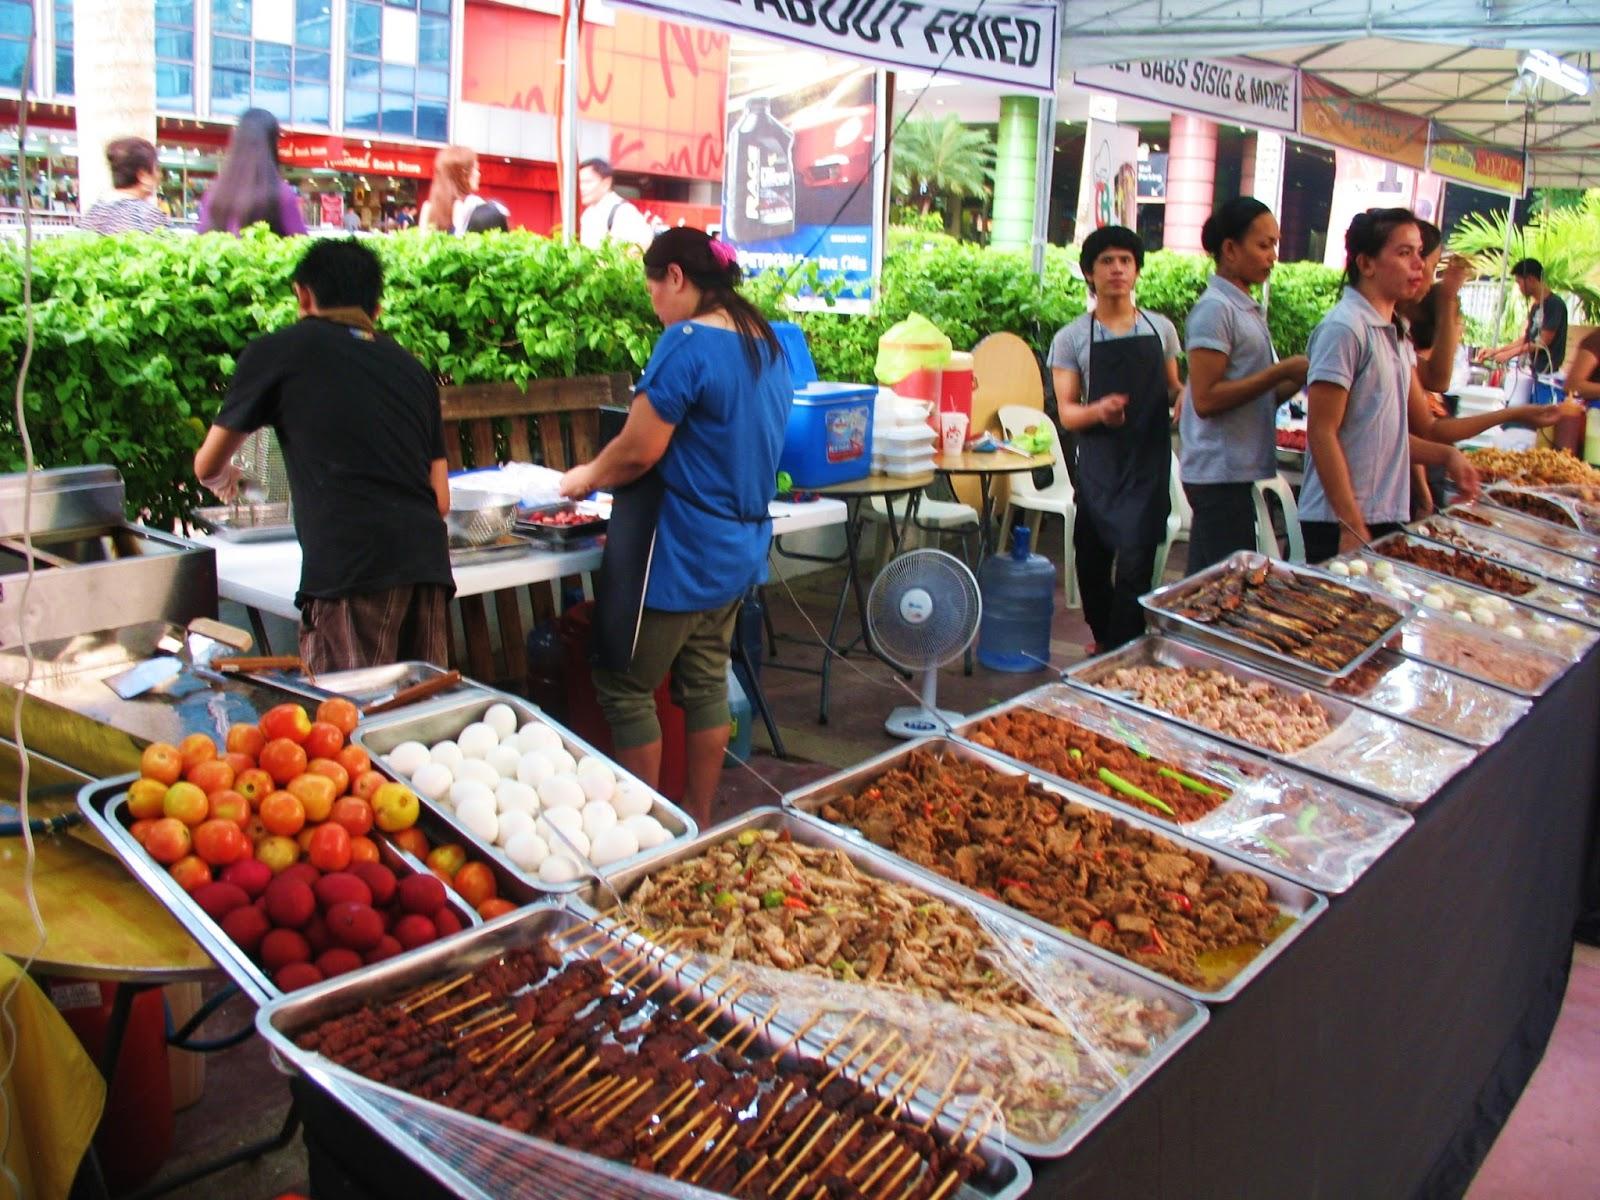 Gridcrosser grubs greasy easy good outdoor food market for Outdoor food market